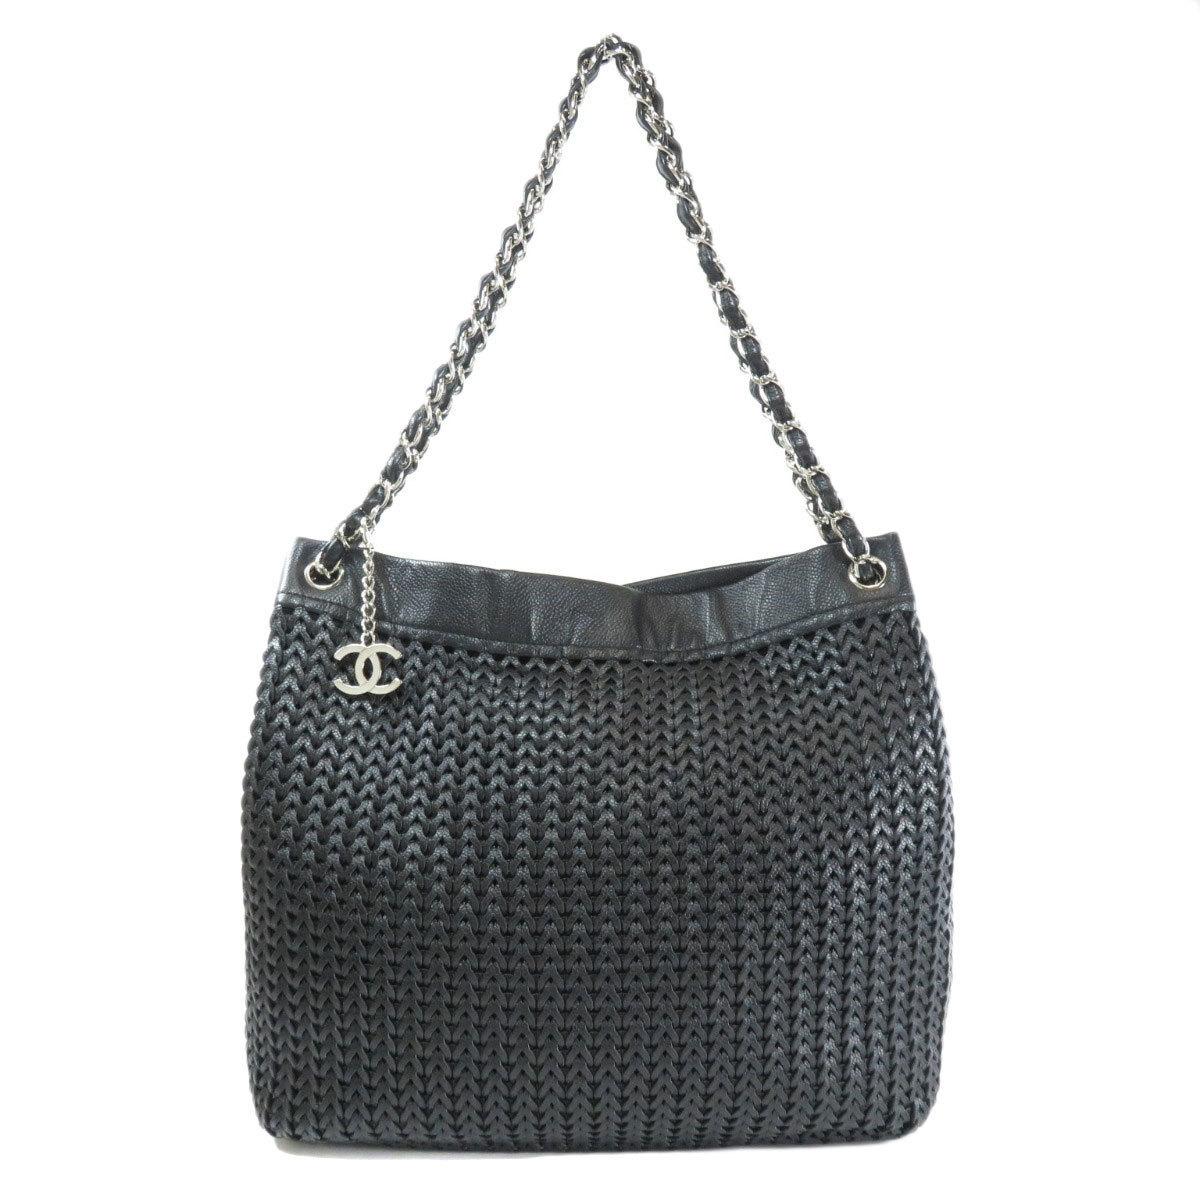 Chanel Chain Motif Coco Mark Tote Bag Calf Ladies